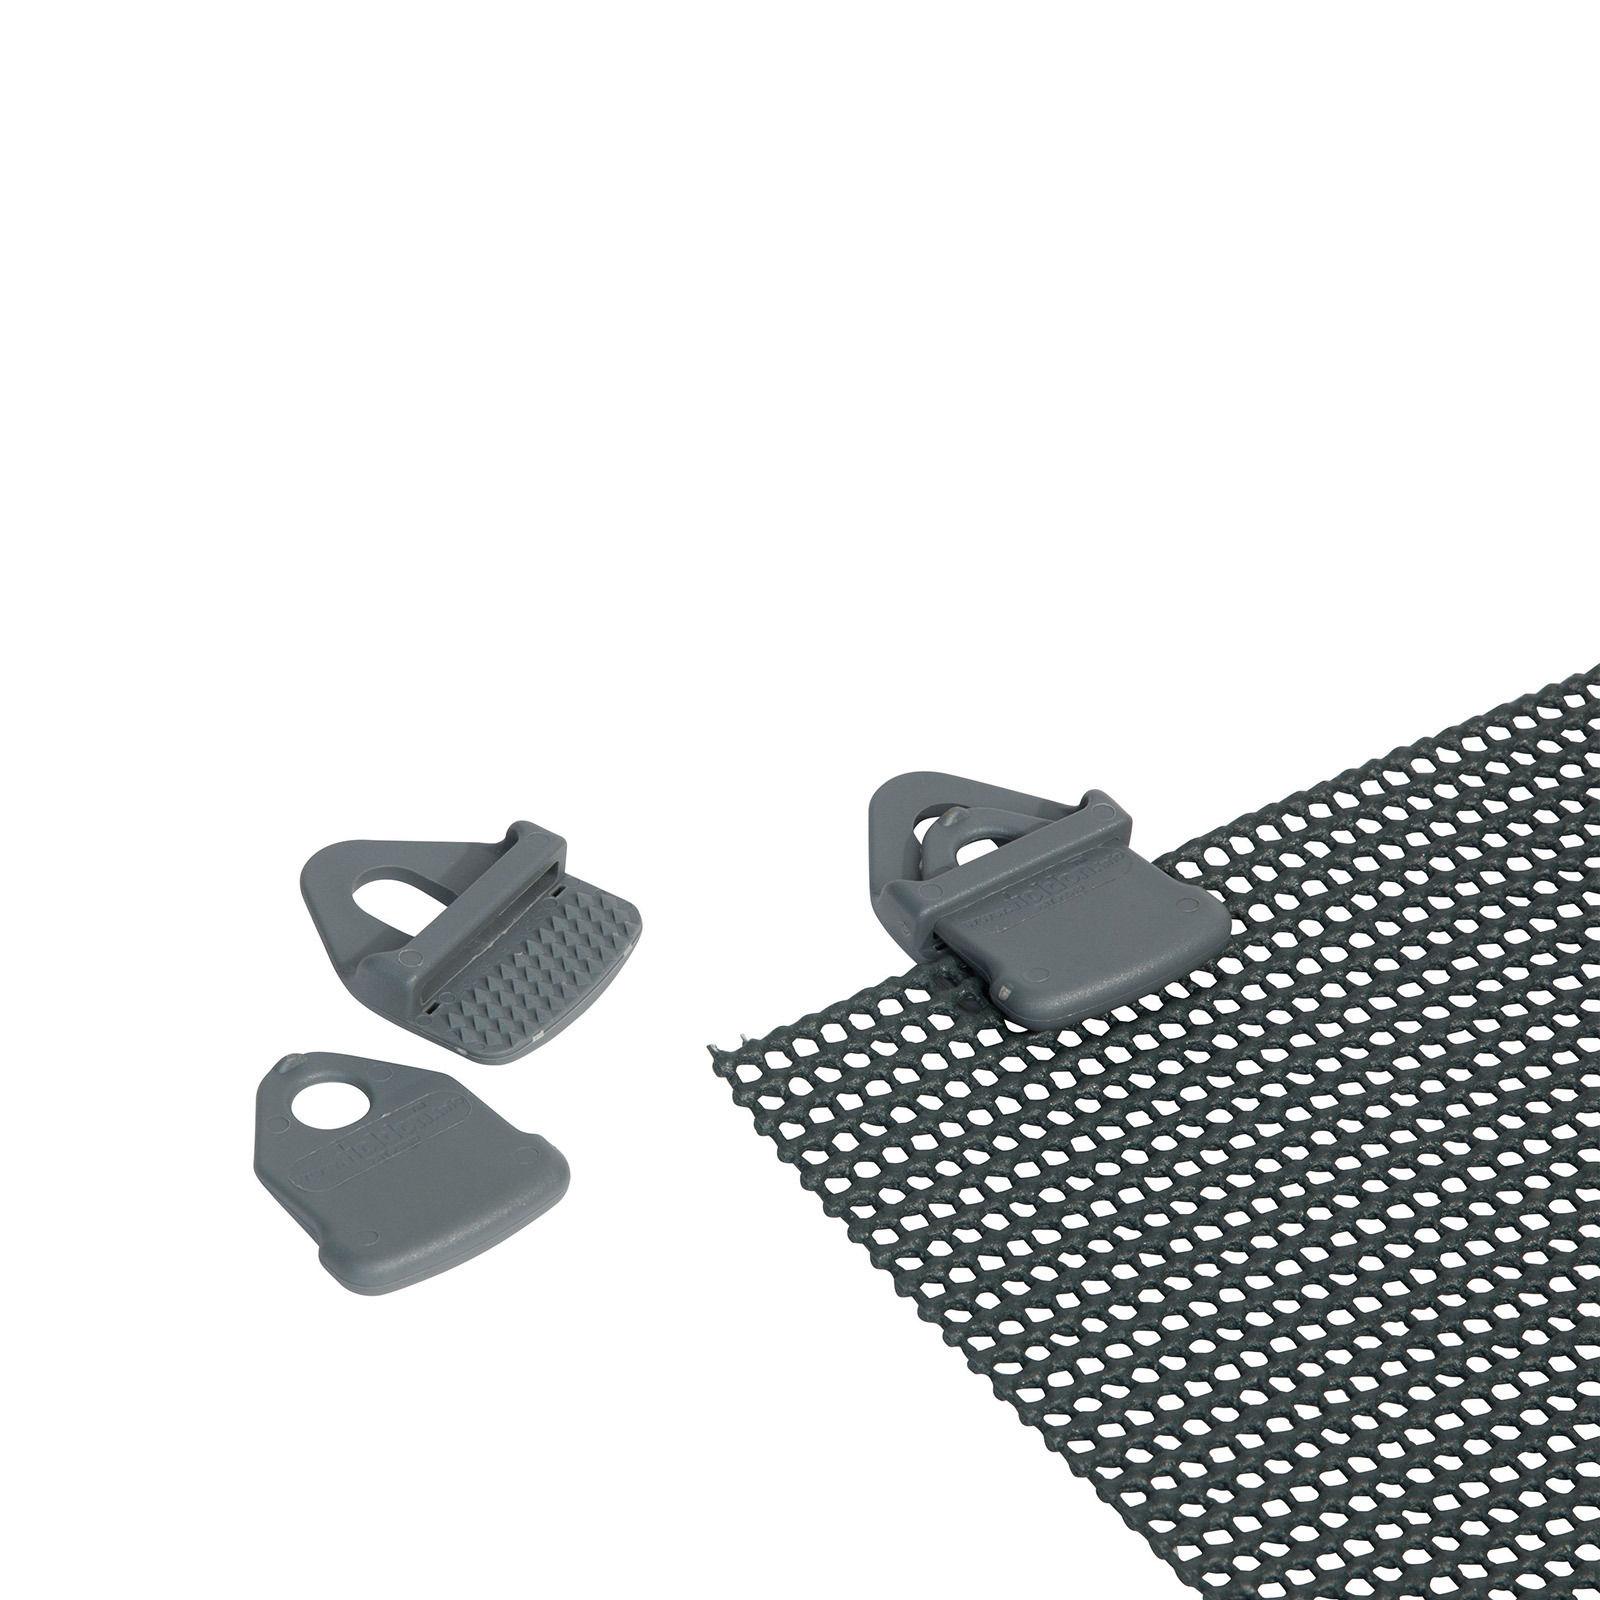 4 Universal Clips Zelt Teppich Boden Schnellspann Klemme